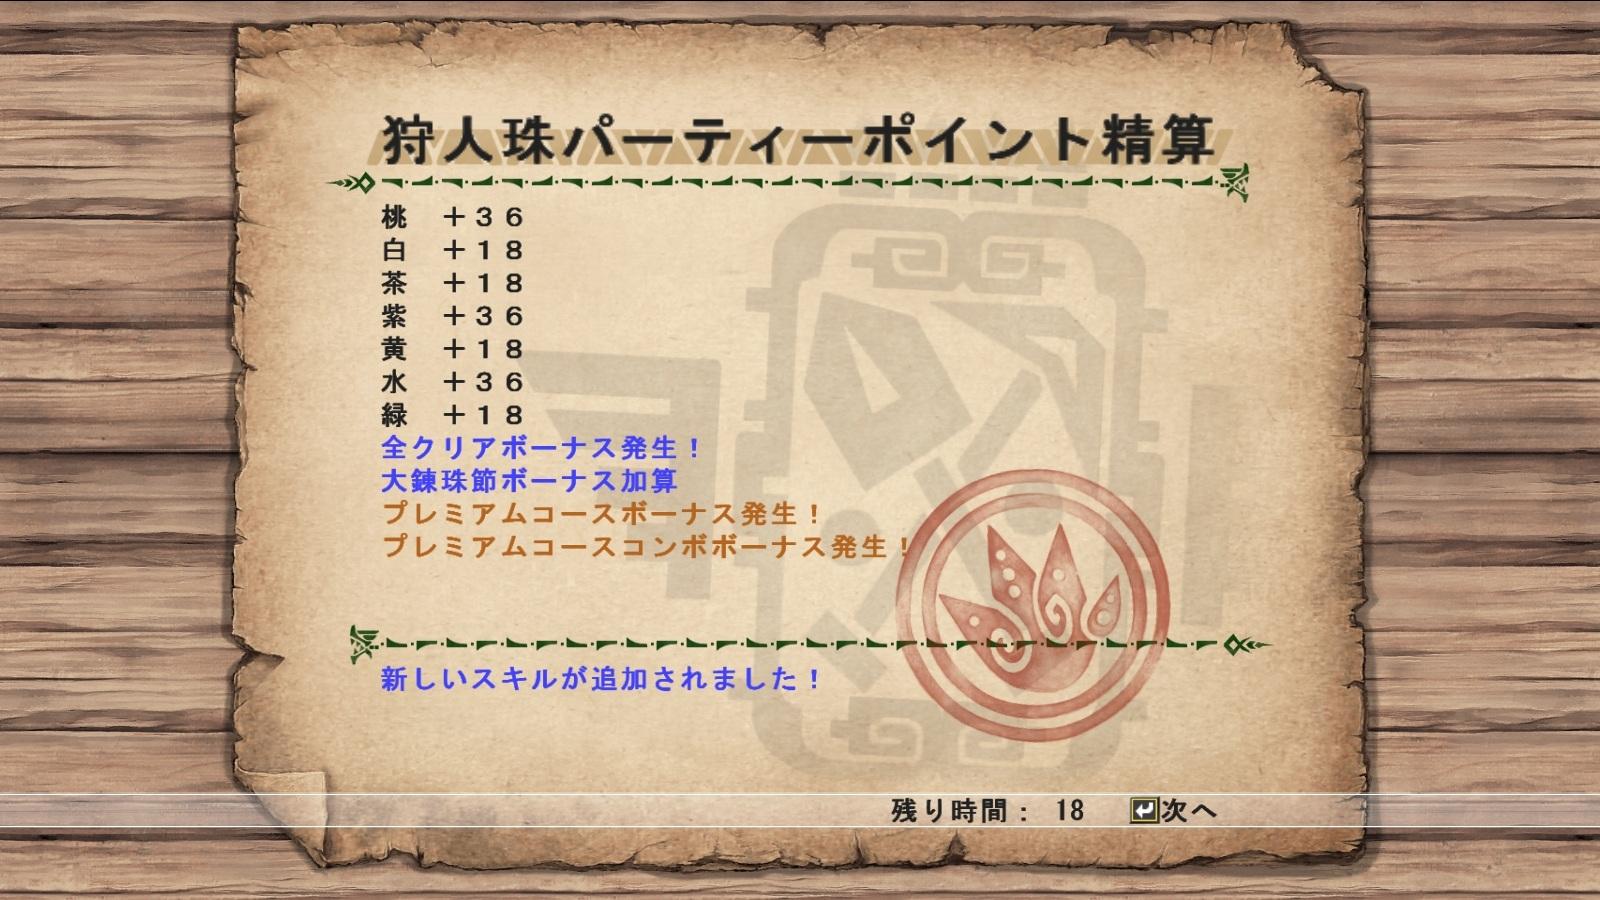 Mhf_20130101_165803_588